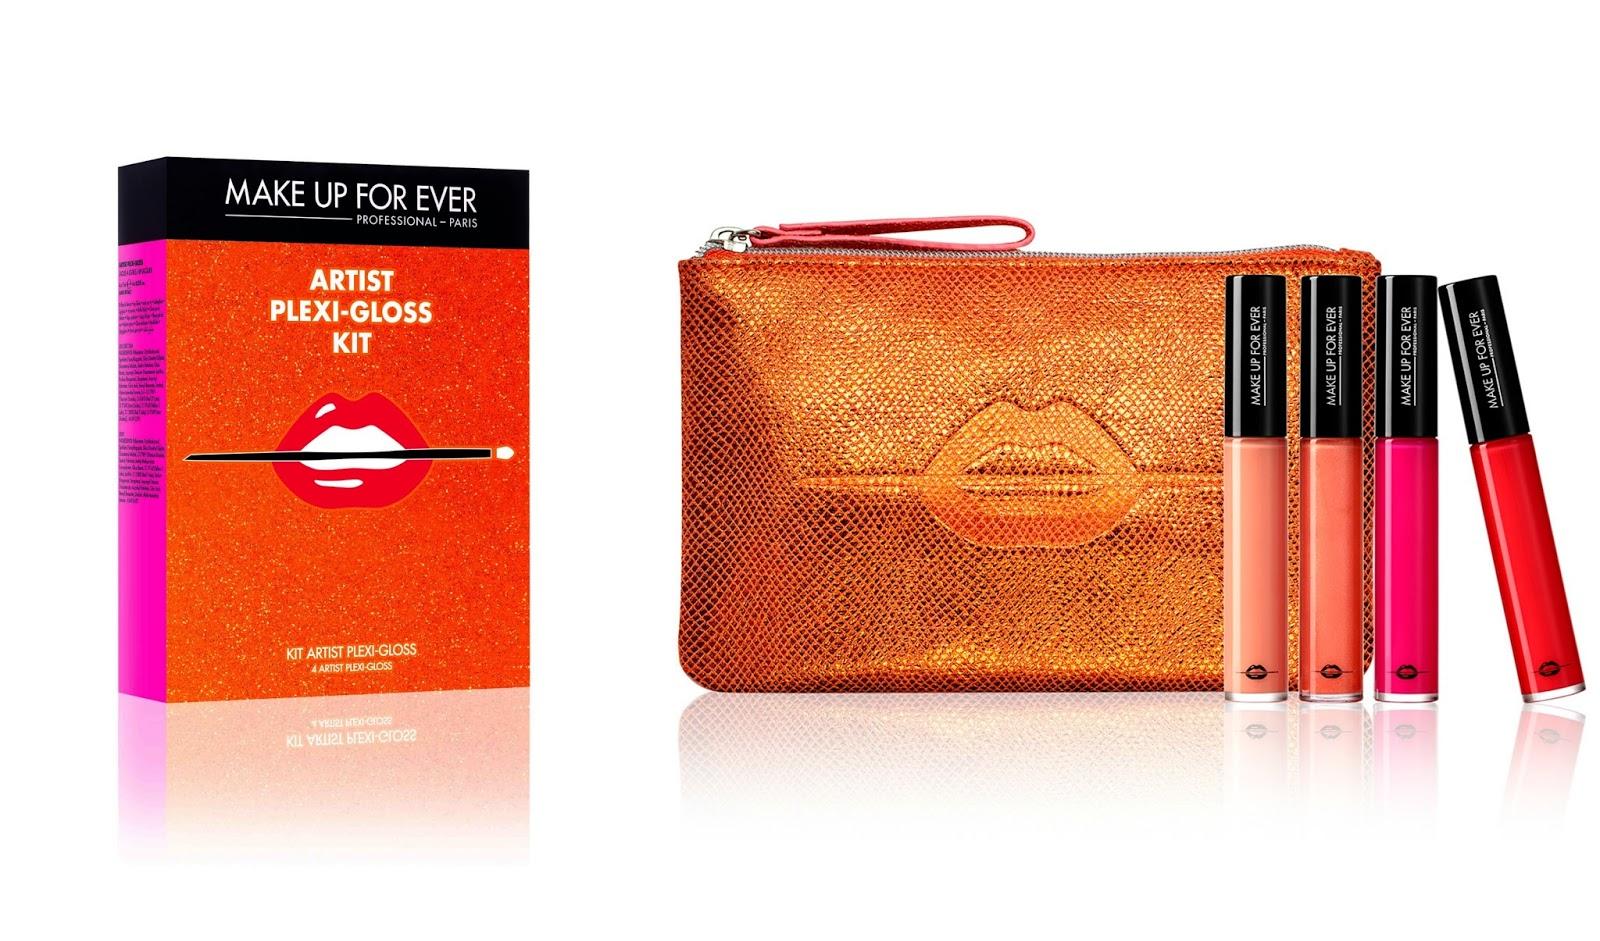 Artist Plexi-Gloss Kit